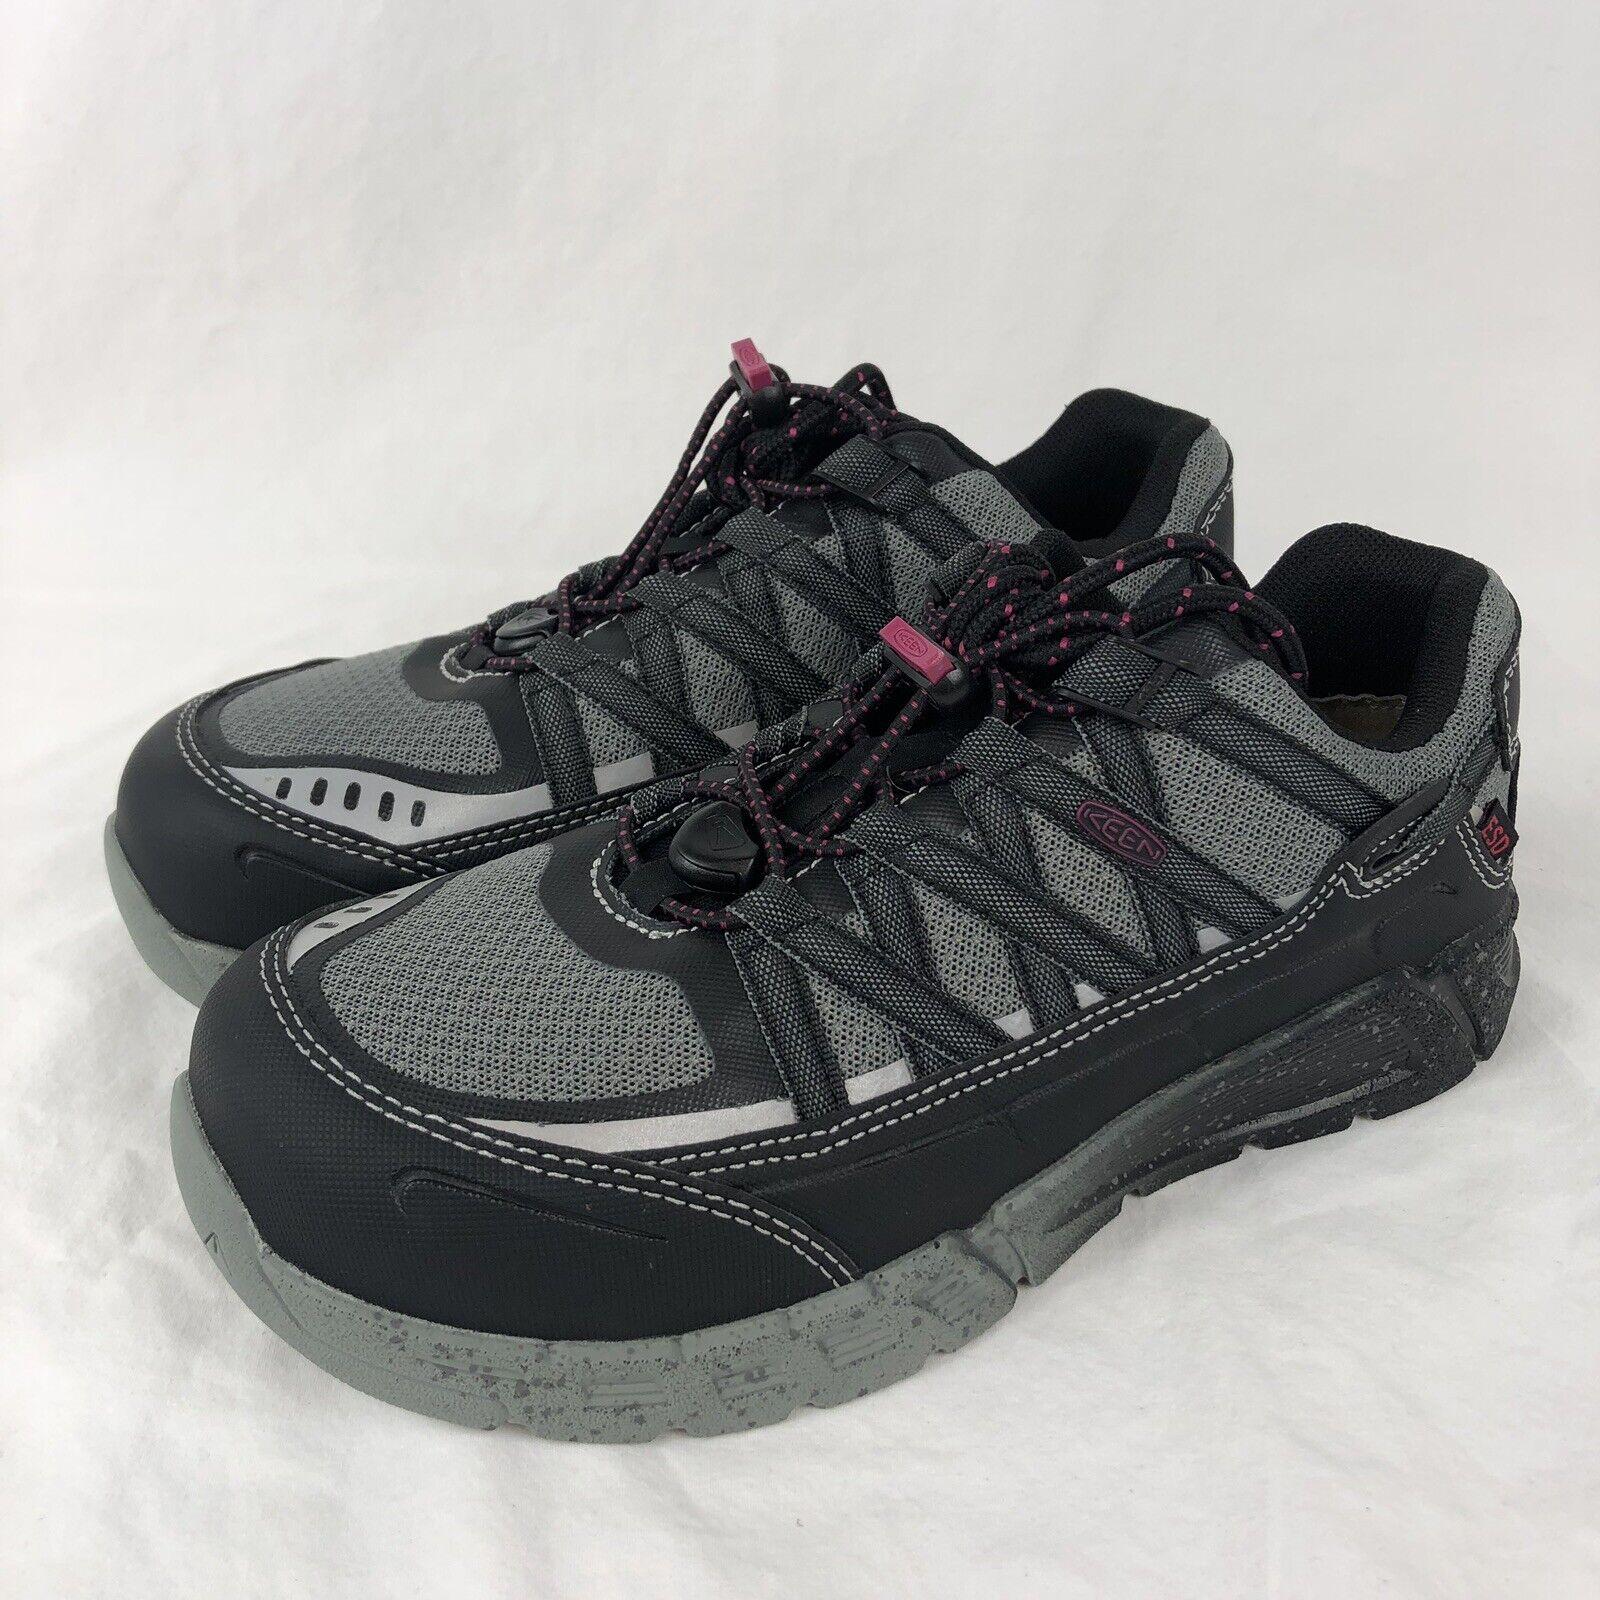 Keen Utility Asheville  at ESD Wouomo 10 Aluminum Toe Work scarpe nero 1017073M  marca